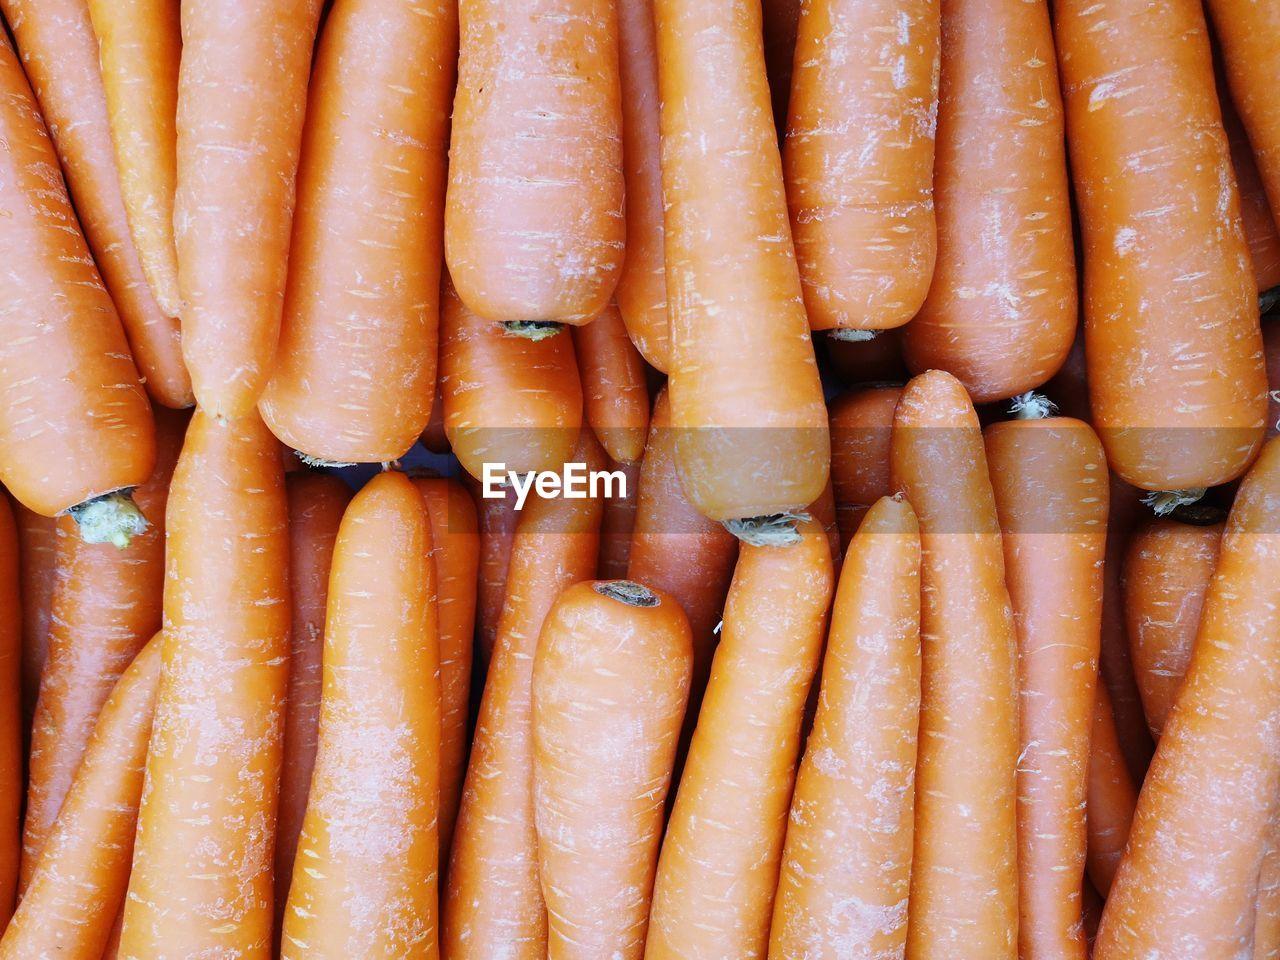 Carrot crunchy powerfood..